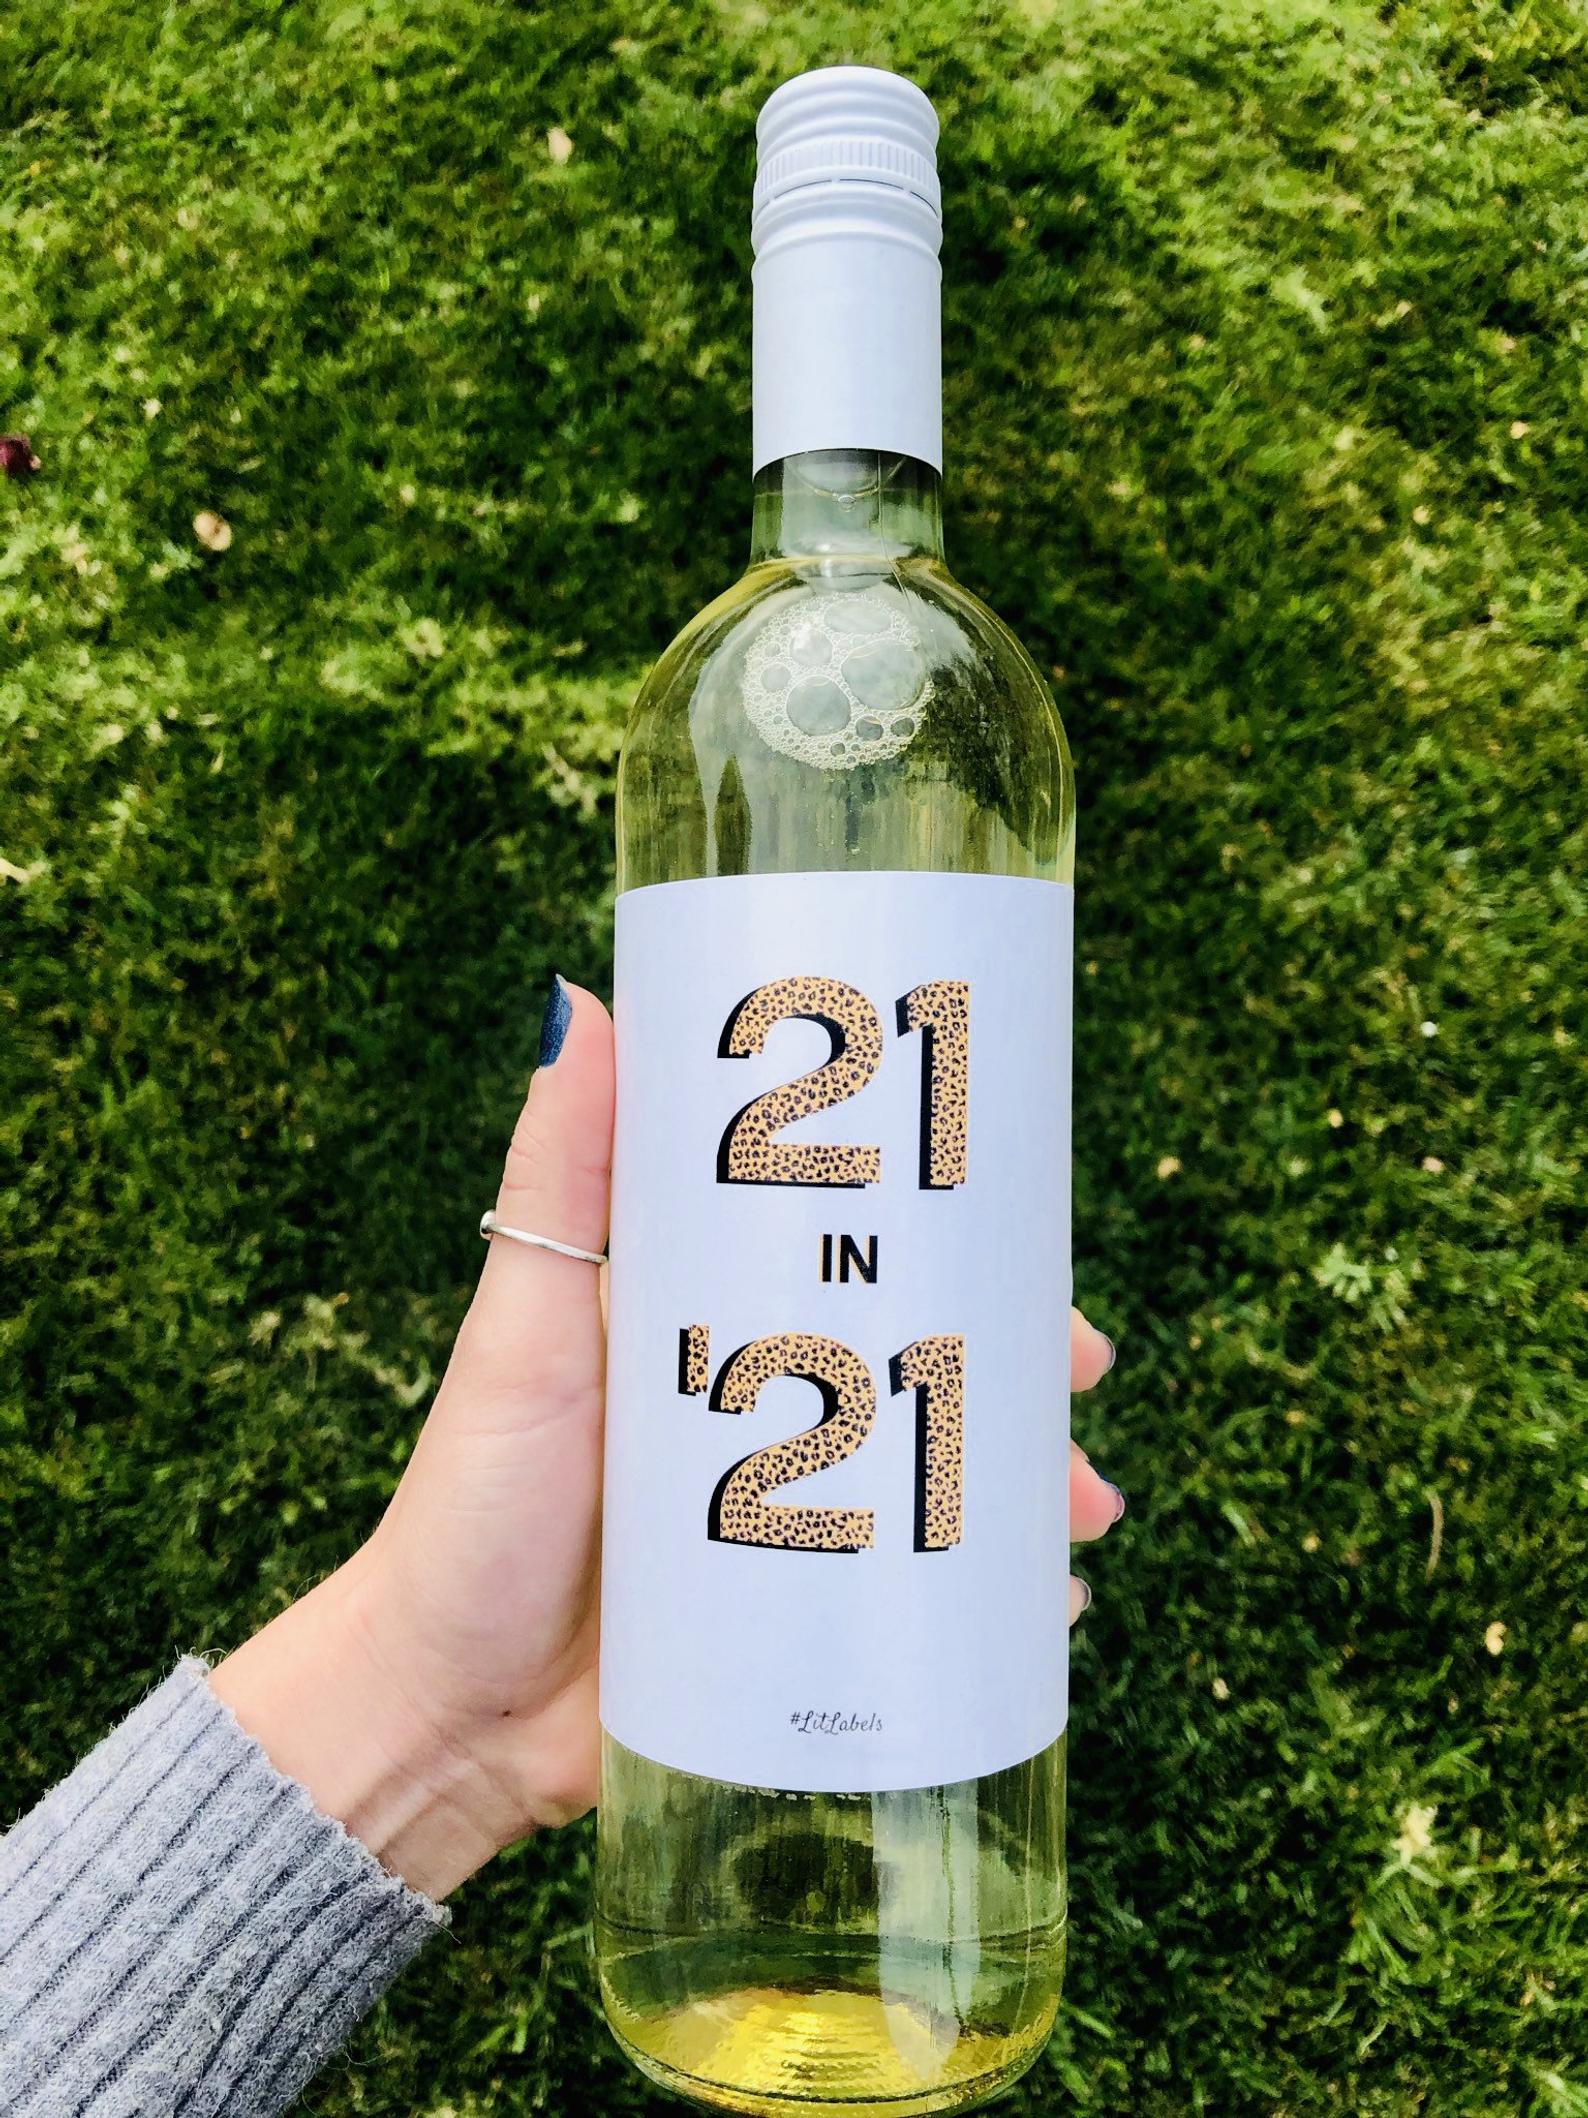 21st birthday gift ideas